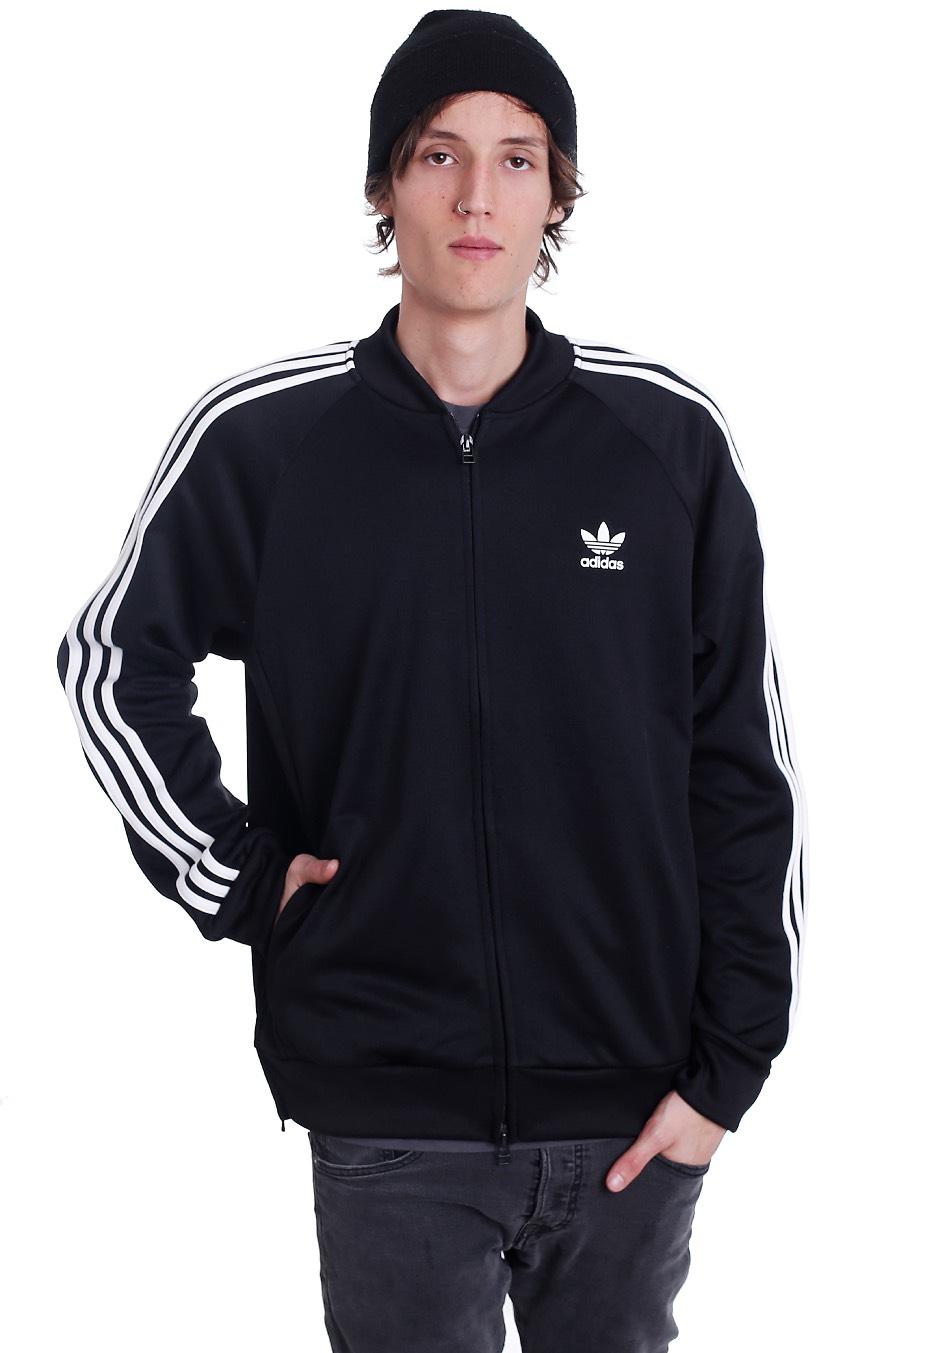 92db343df5e5 Adidas - SST Relax Black White - Track Jacket - Streetwear Shop -  Impericon.com Worldwide